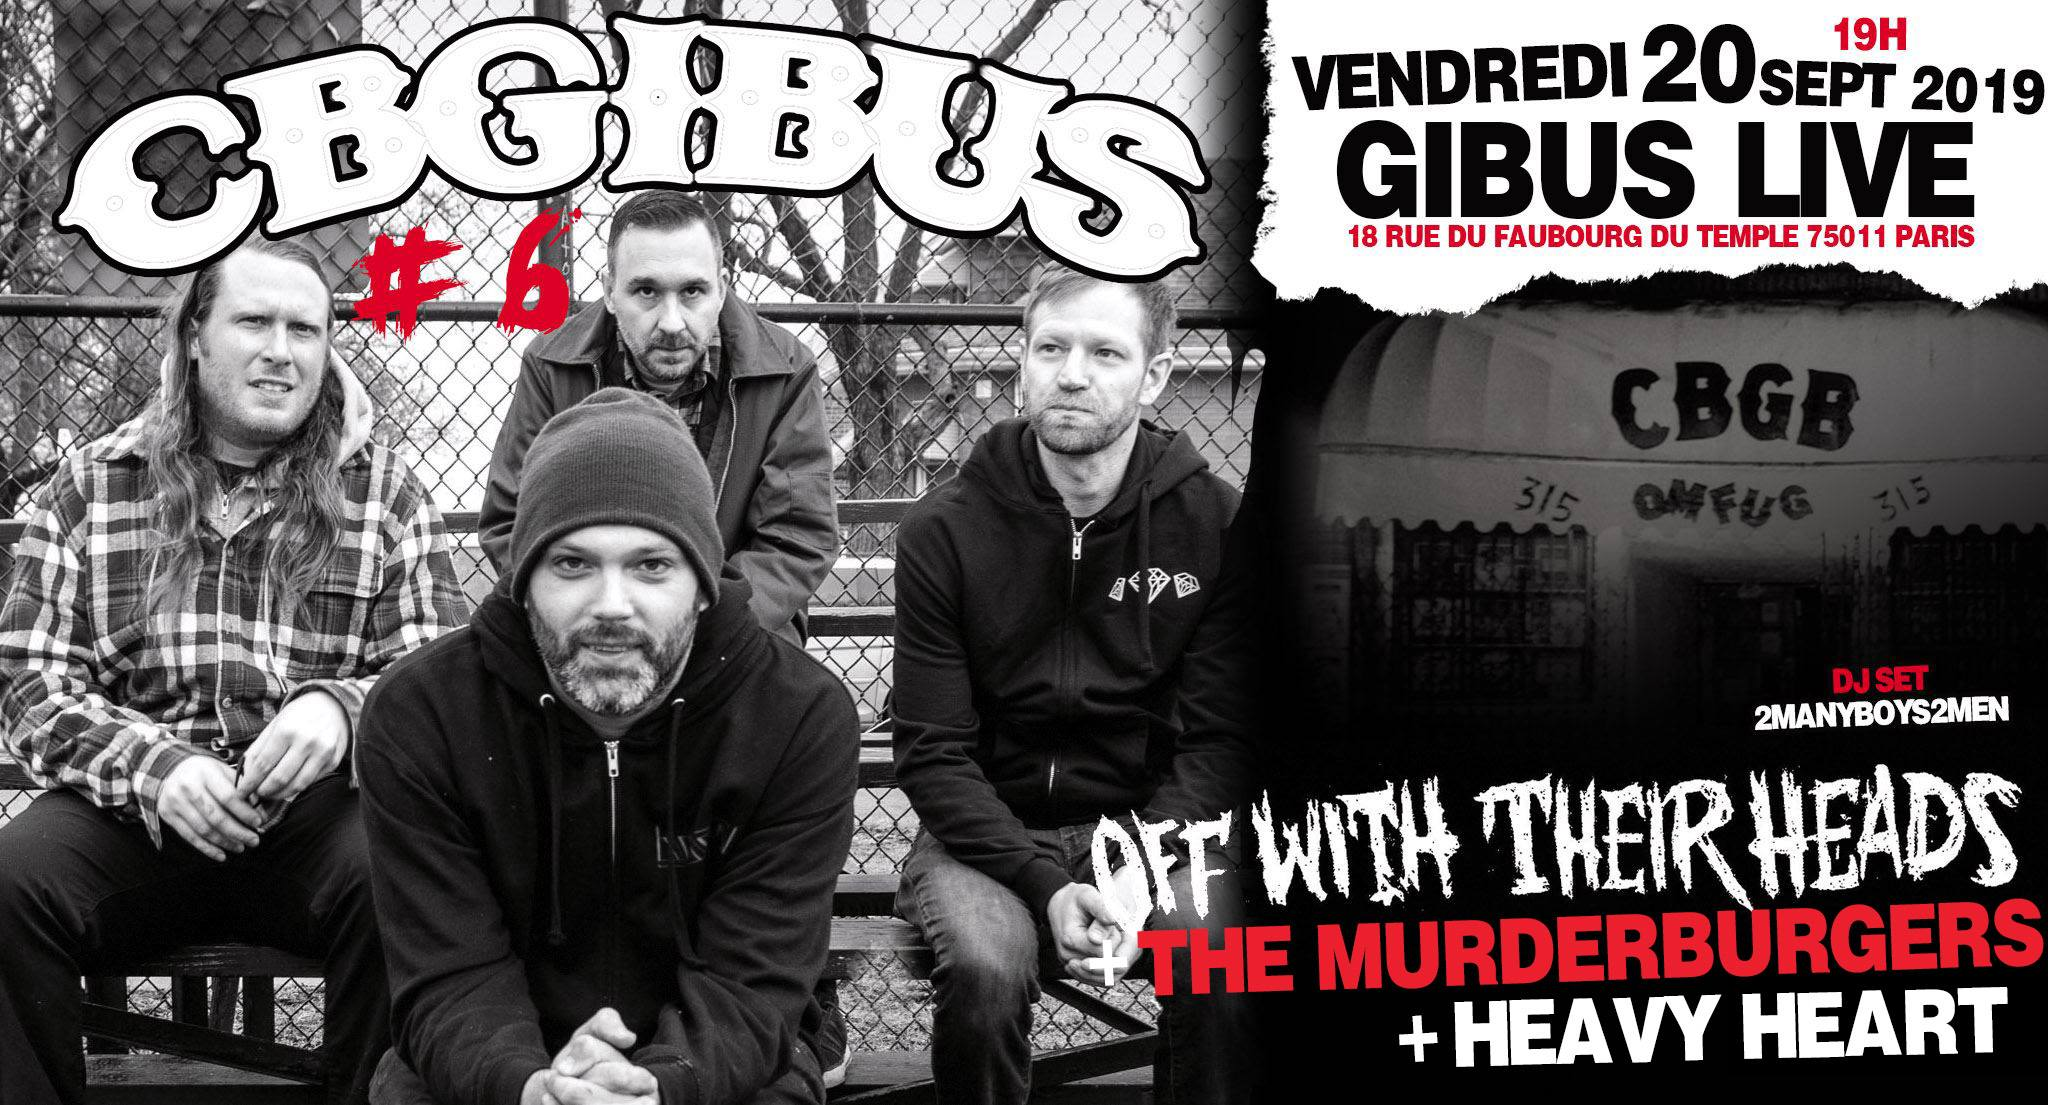 20.09.2019 – CbGibus #6 – Off with their heads X Murderburgers X Heavy heart